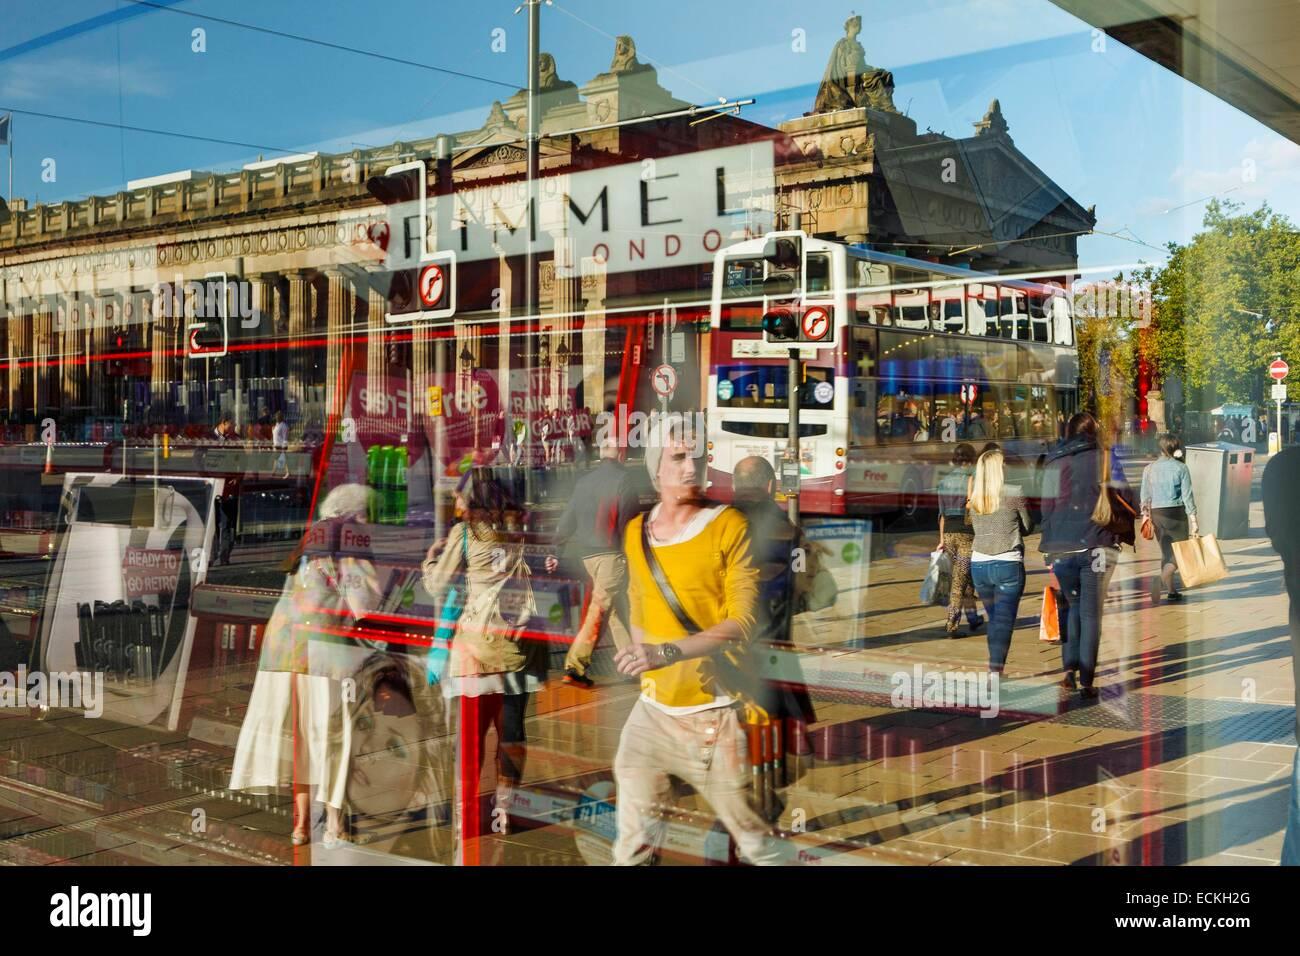 United Kingdom, Scotland, Edinburg, Princes Street, shopping street, street scene and reflection showcase - Stock Image